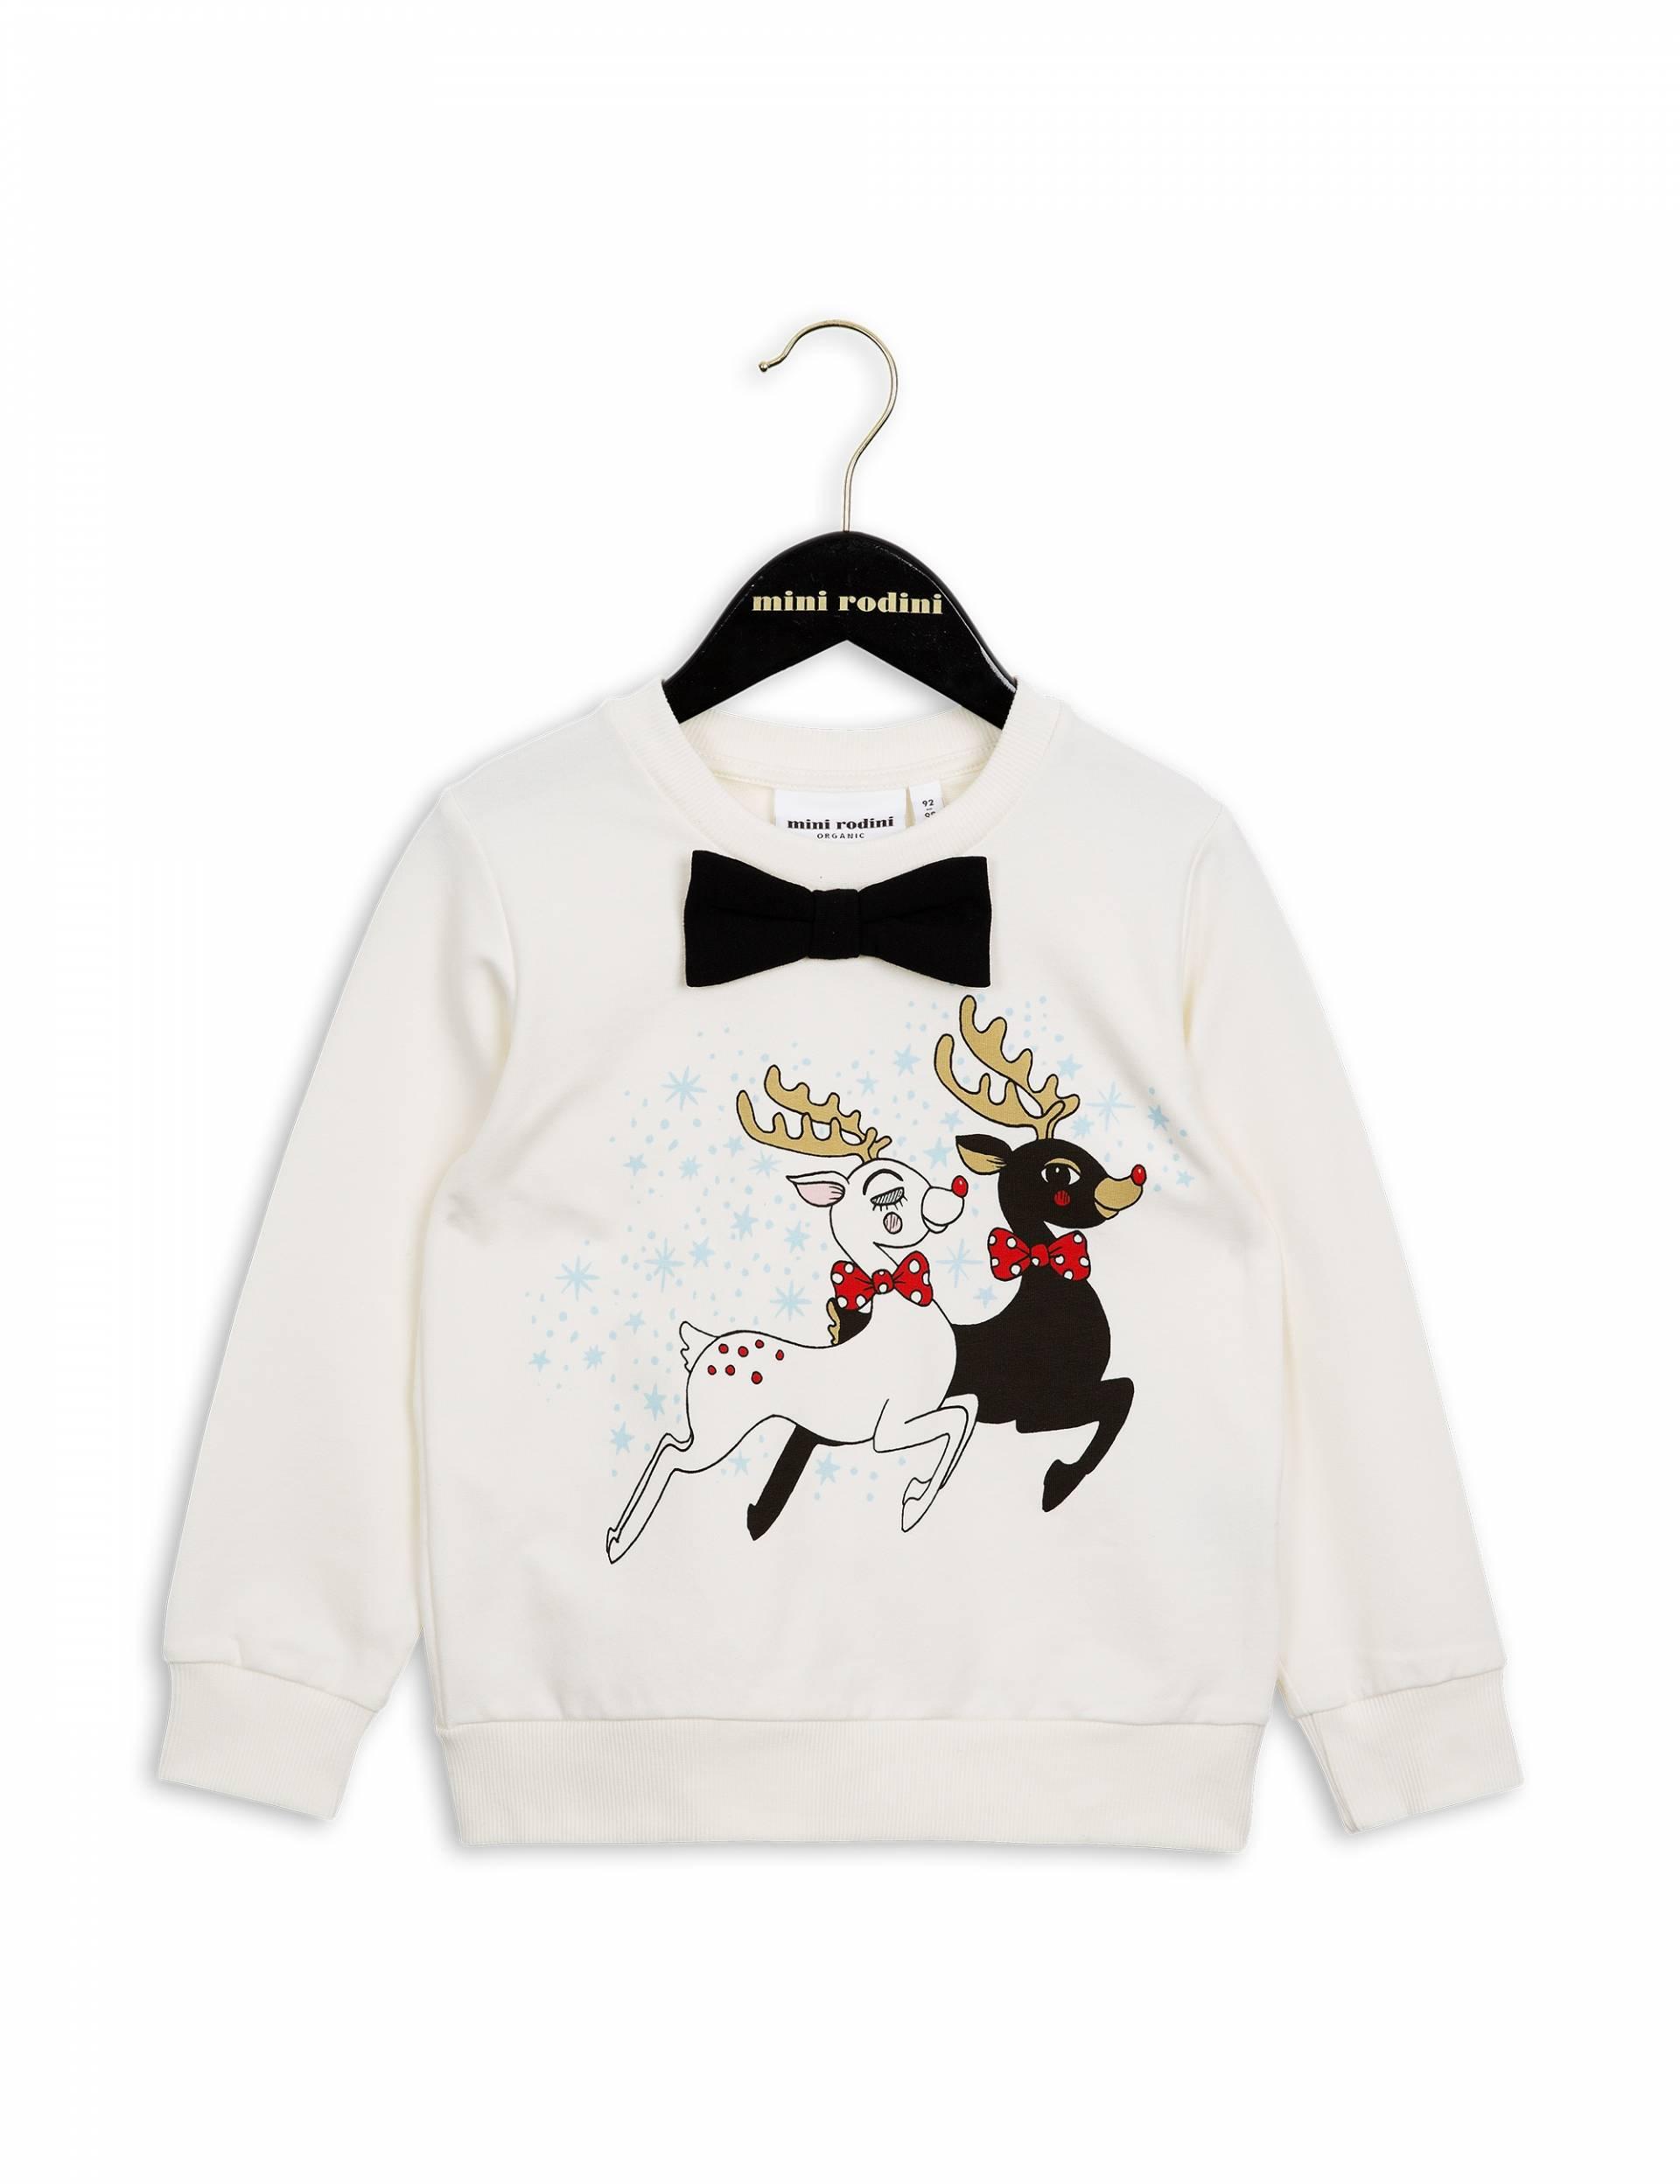 5749_072101b642-1672020511-mini-rodini-reindeer-sp-sweatshirt-bow-off-white-1-big